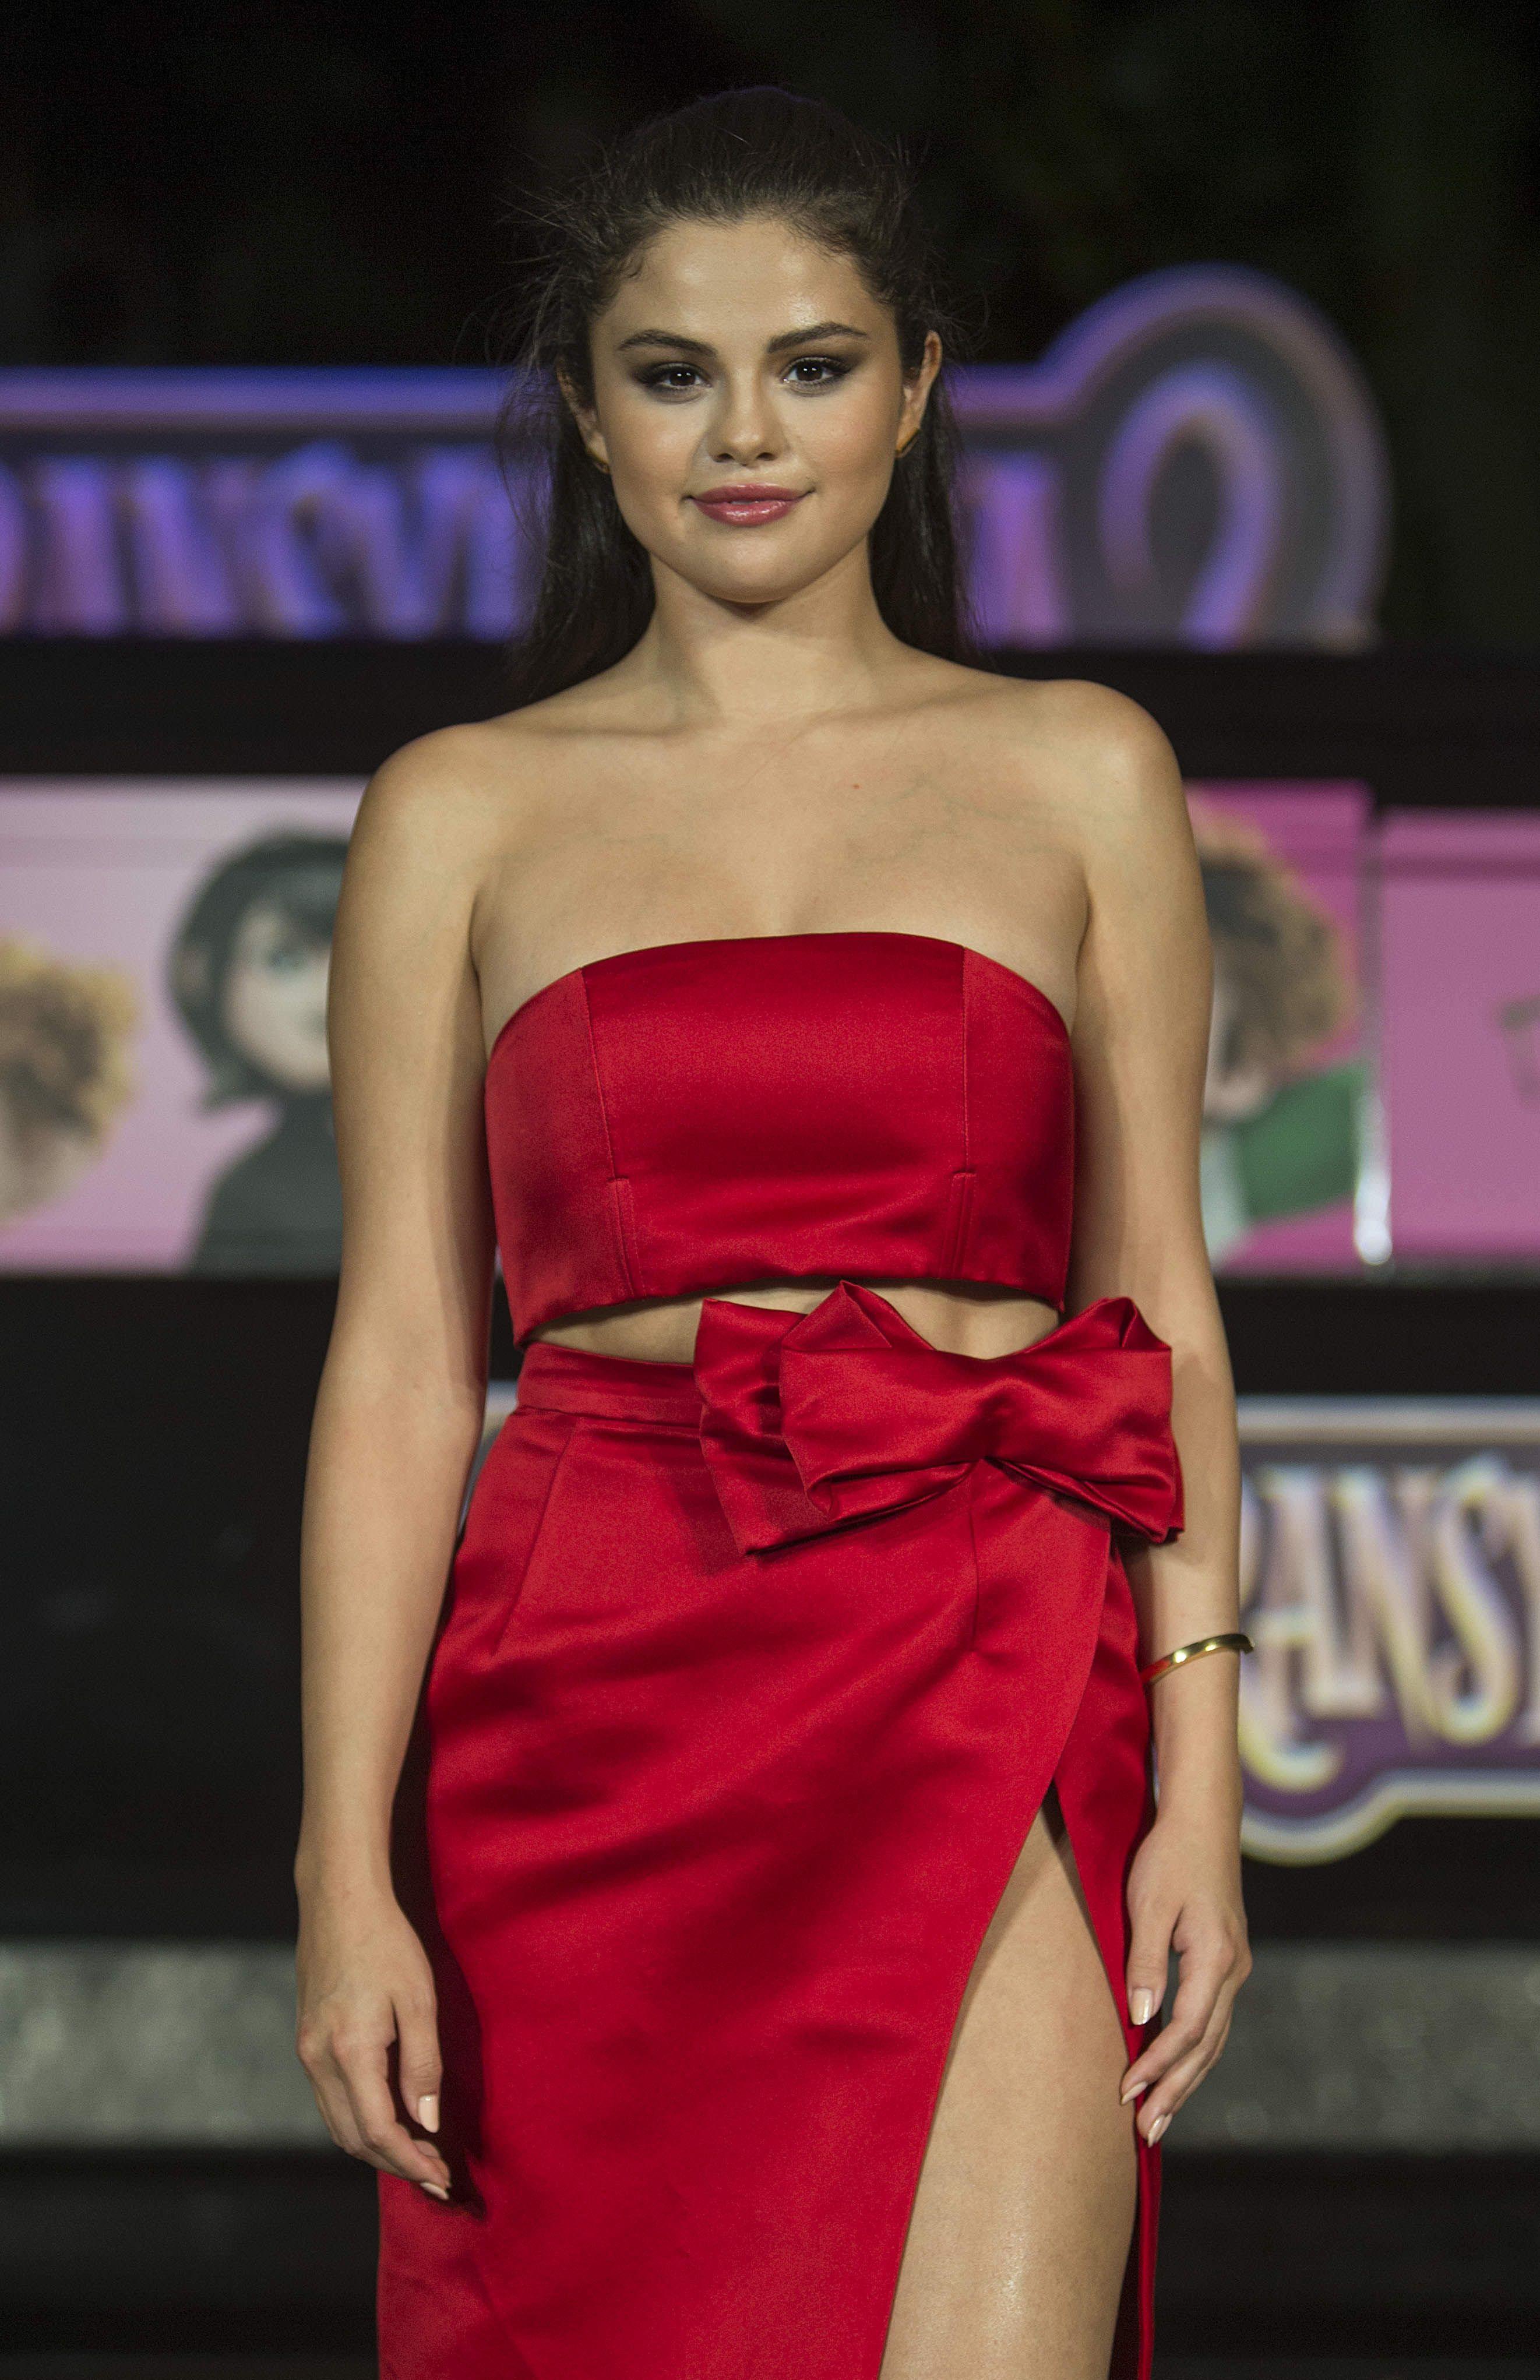 Hot! selena gomez red, Hotel Transylvania Series